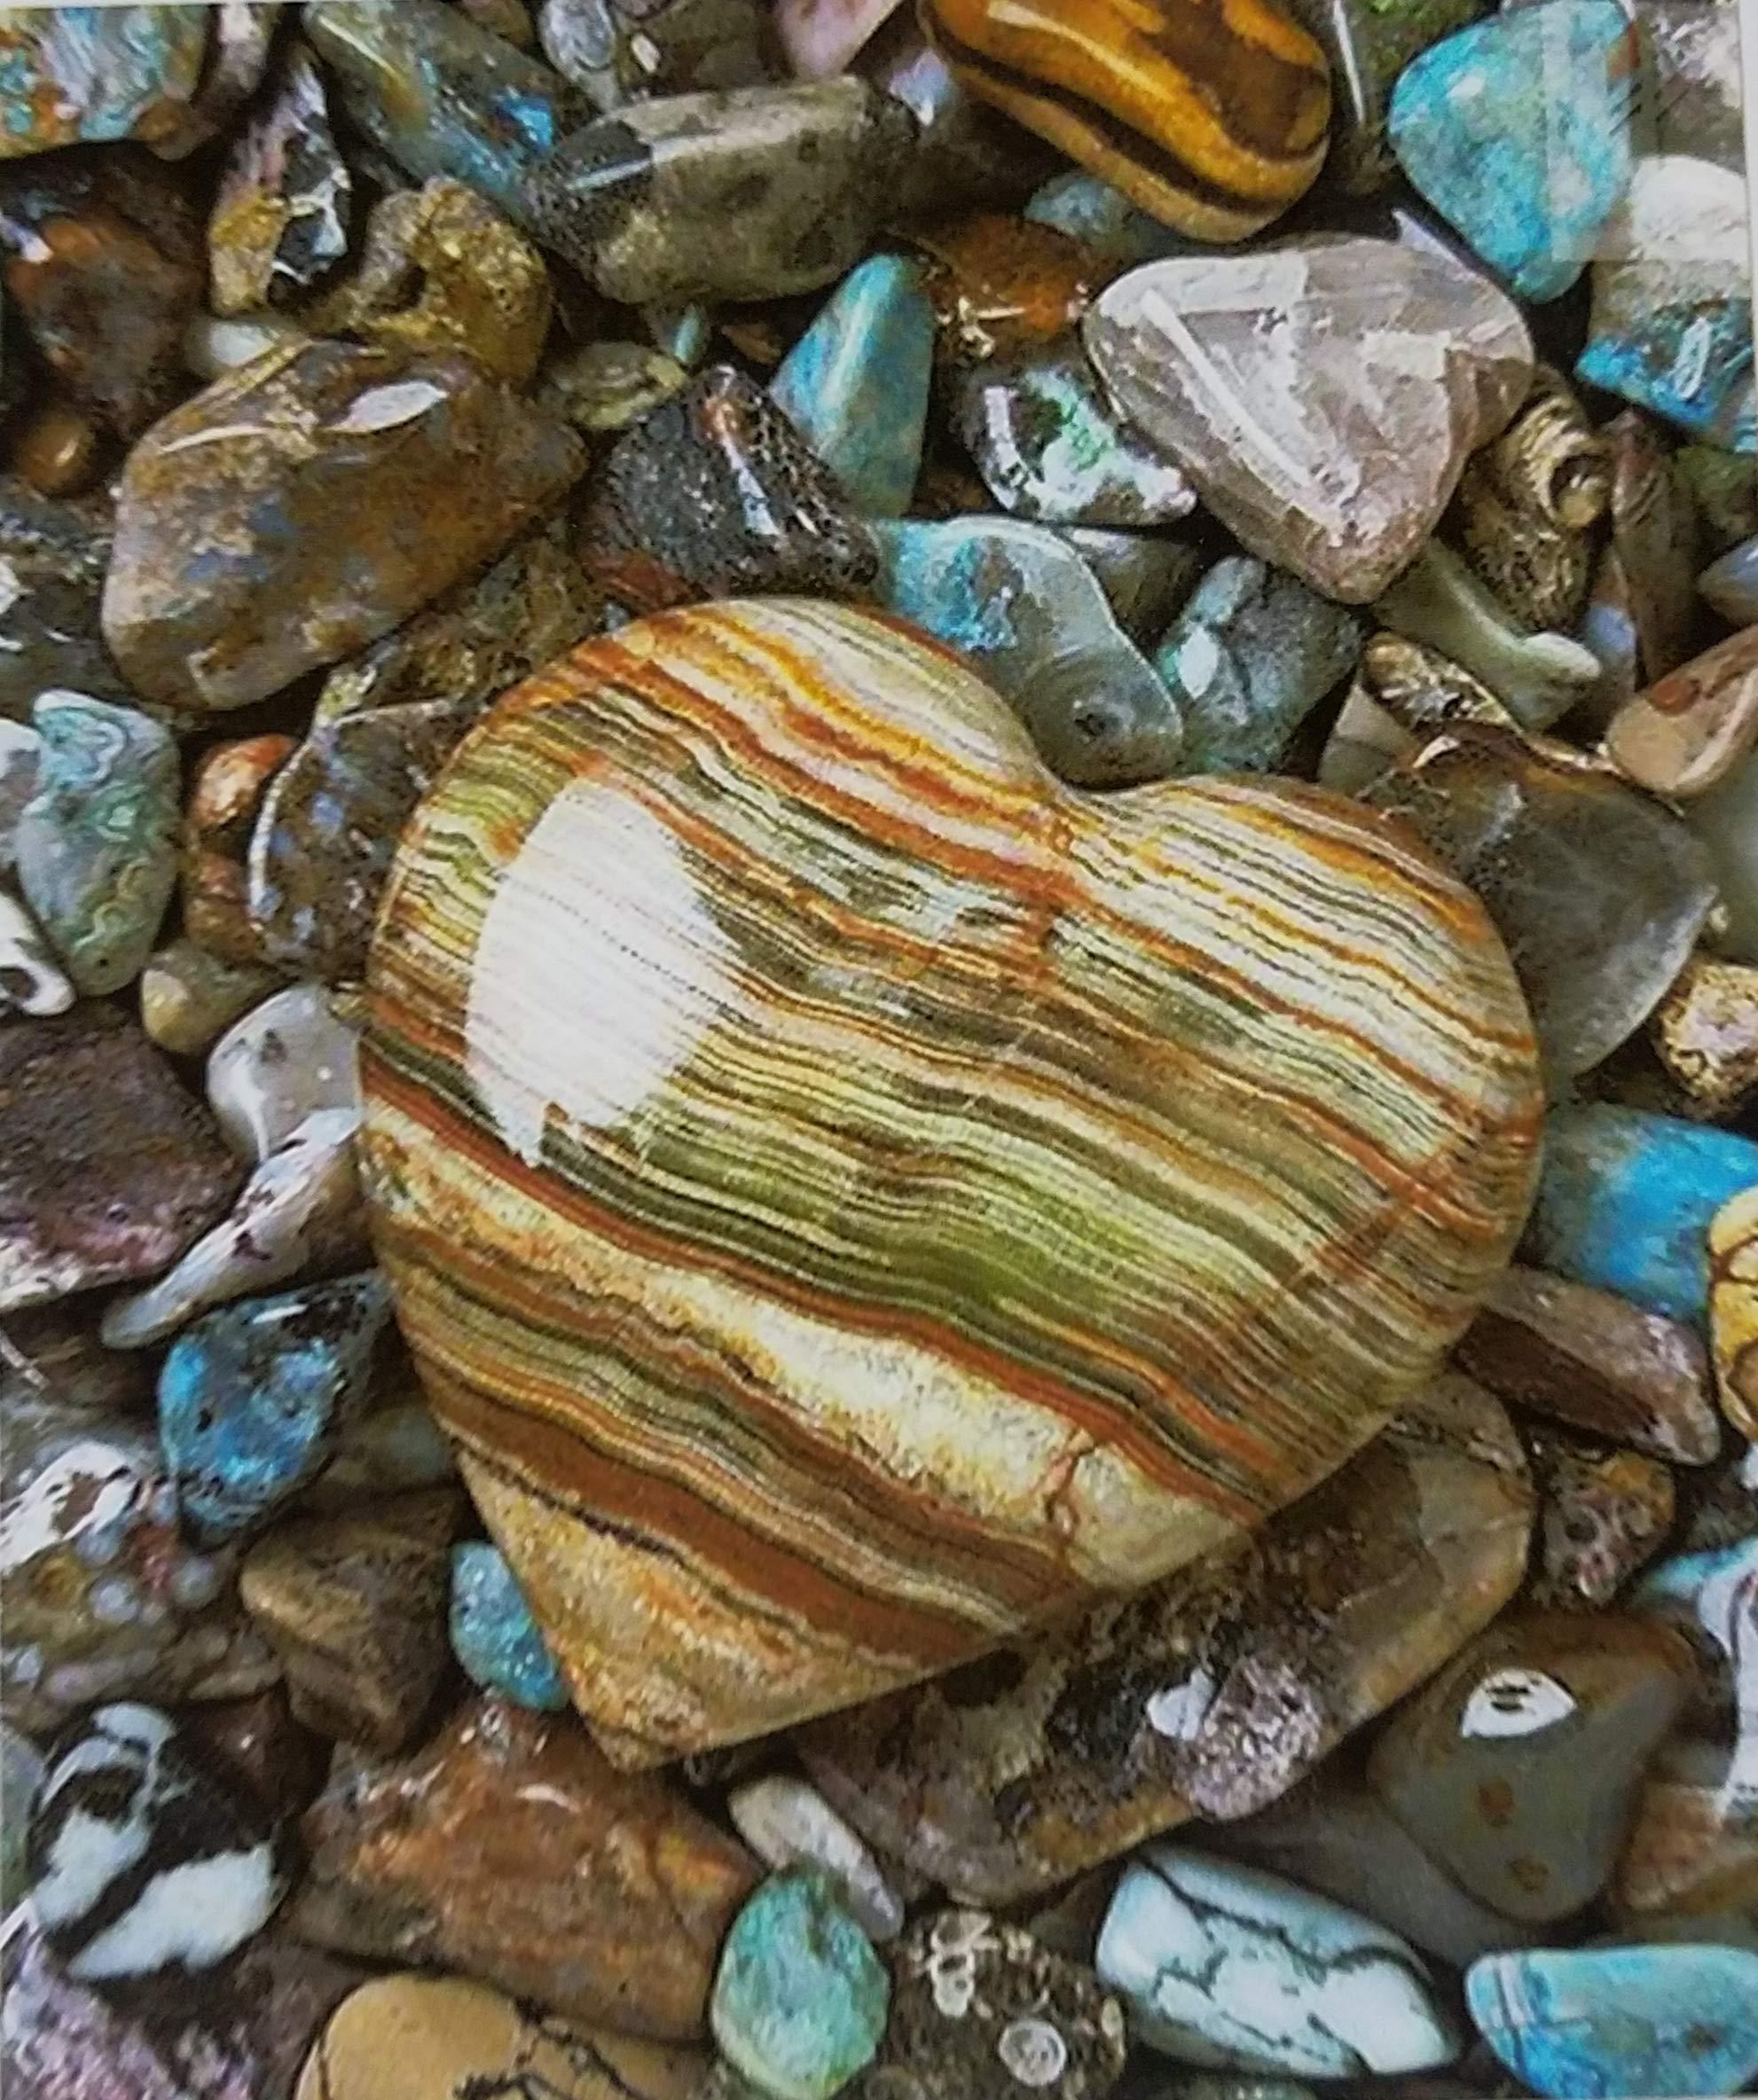 Imagine Micromosaics 5D DIY Full Square Drill 40 x 50 cm Mounted Diamond Painting Heart Stone